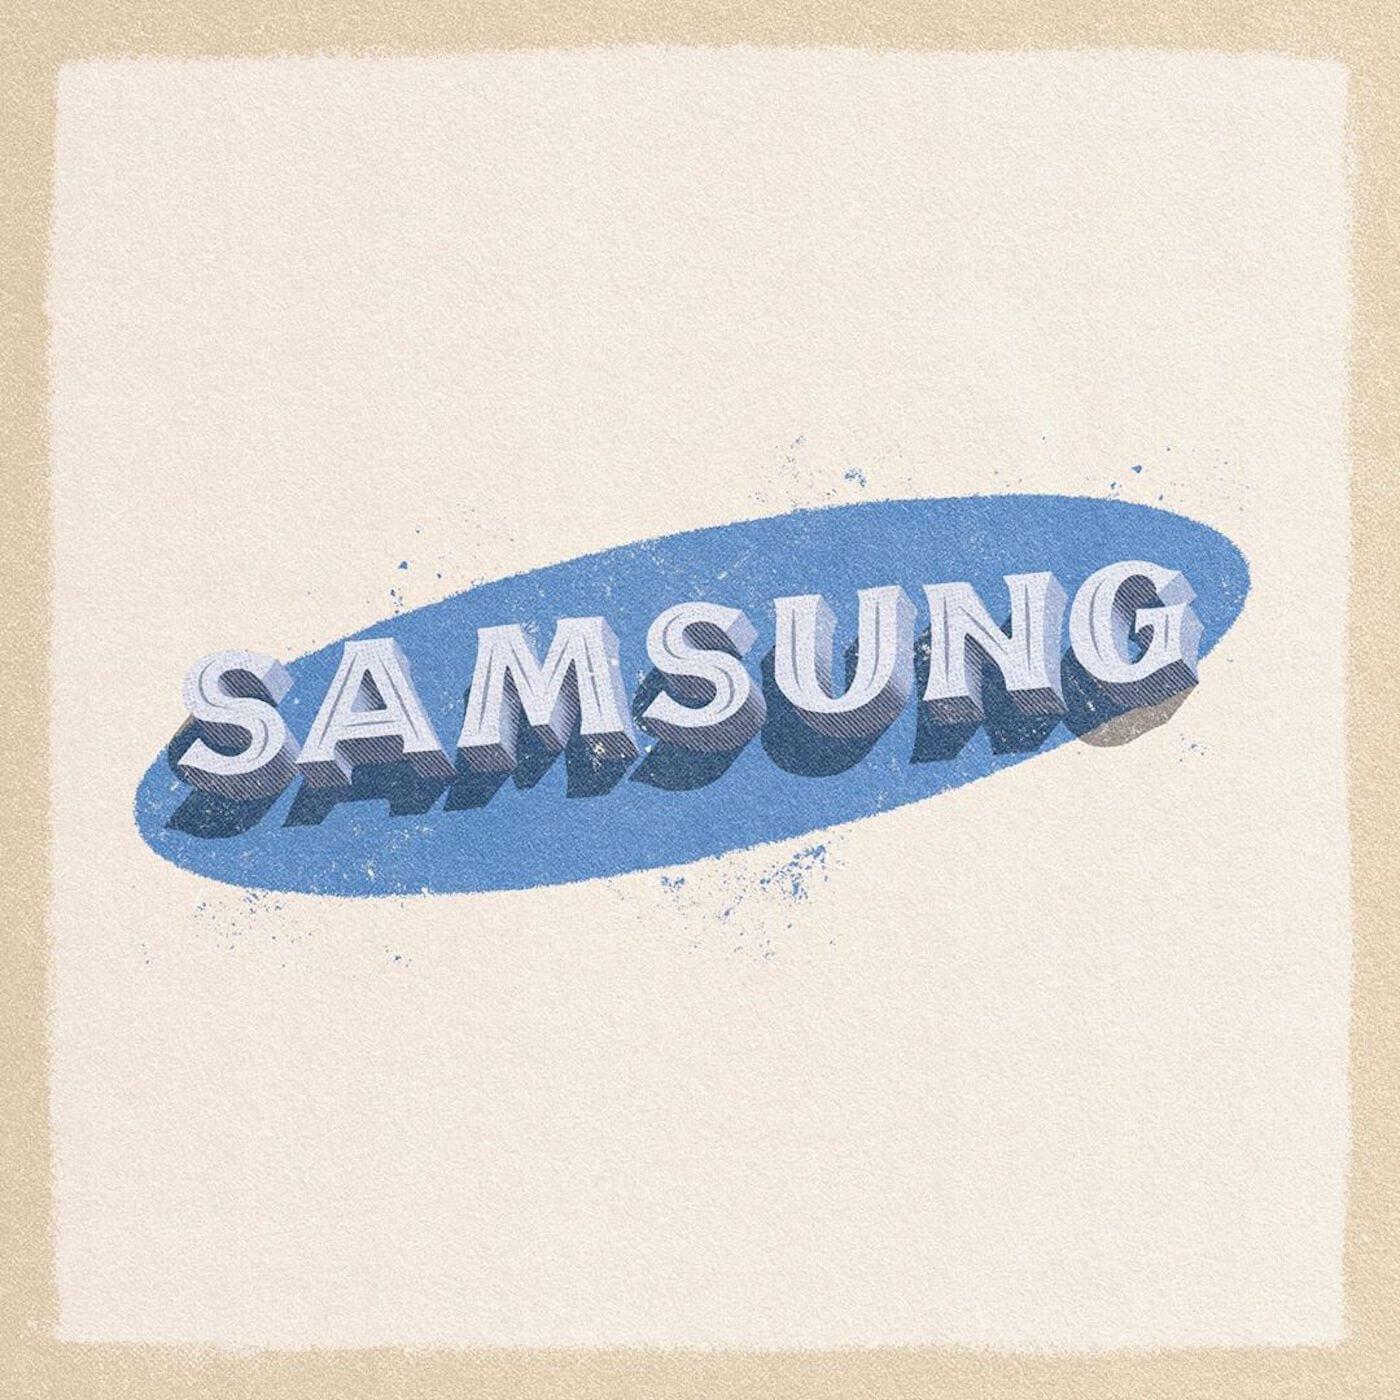 Modern Logos Designed in Vintage Style -santiago-colombo 6-min